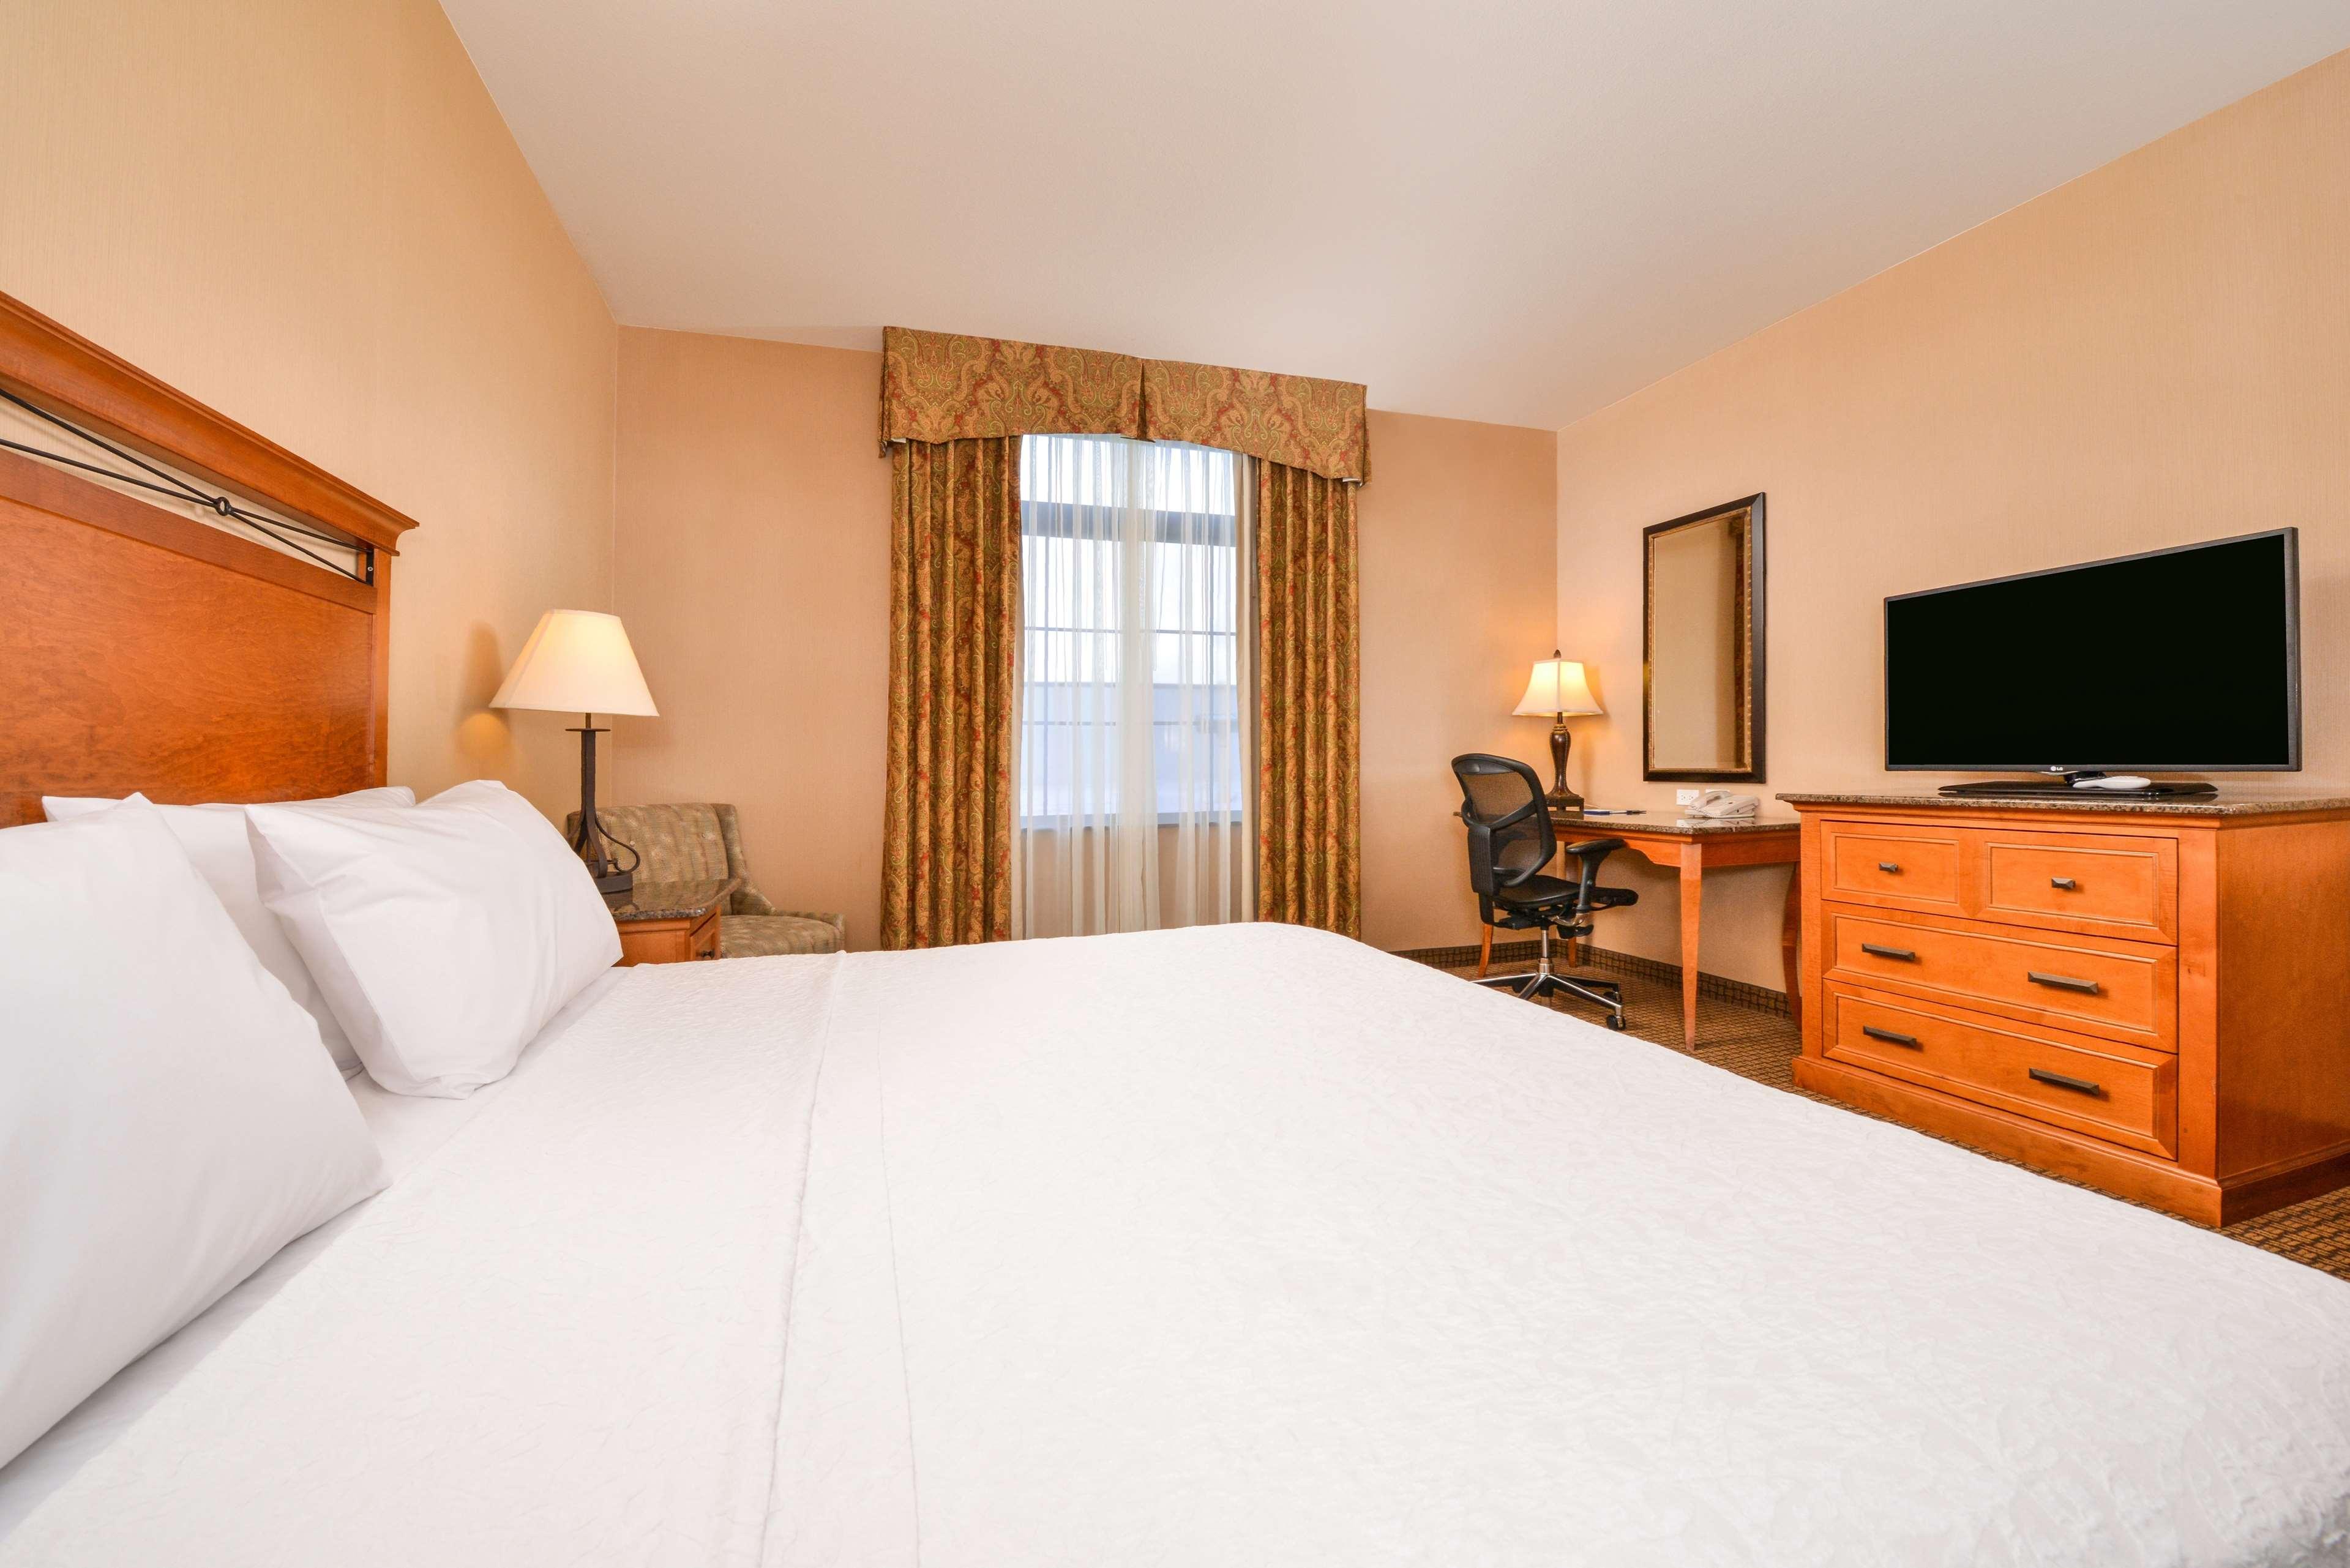 Hampton Inn & Suites Coeur d' Alene image 19